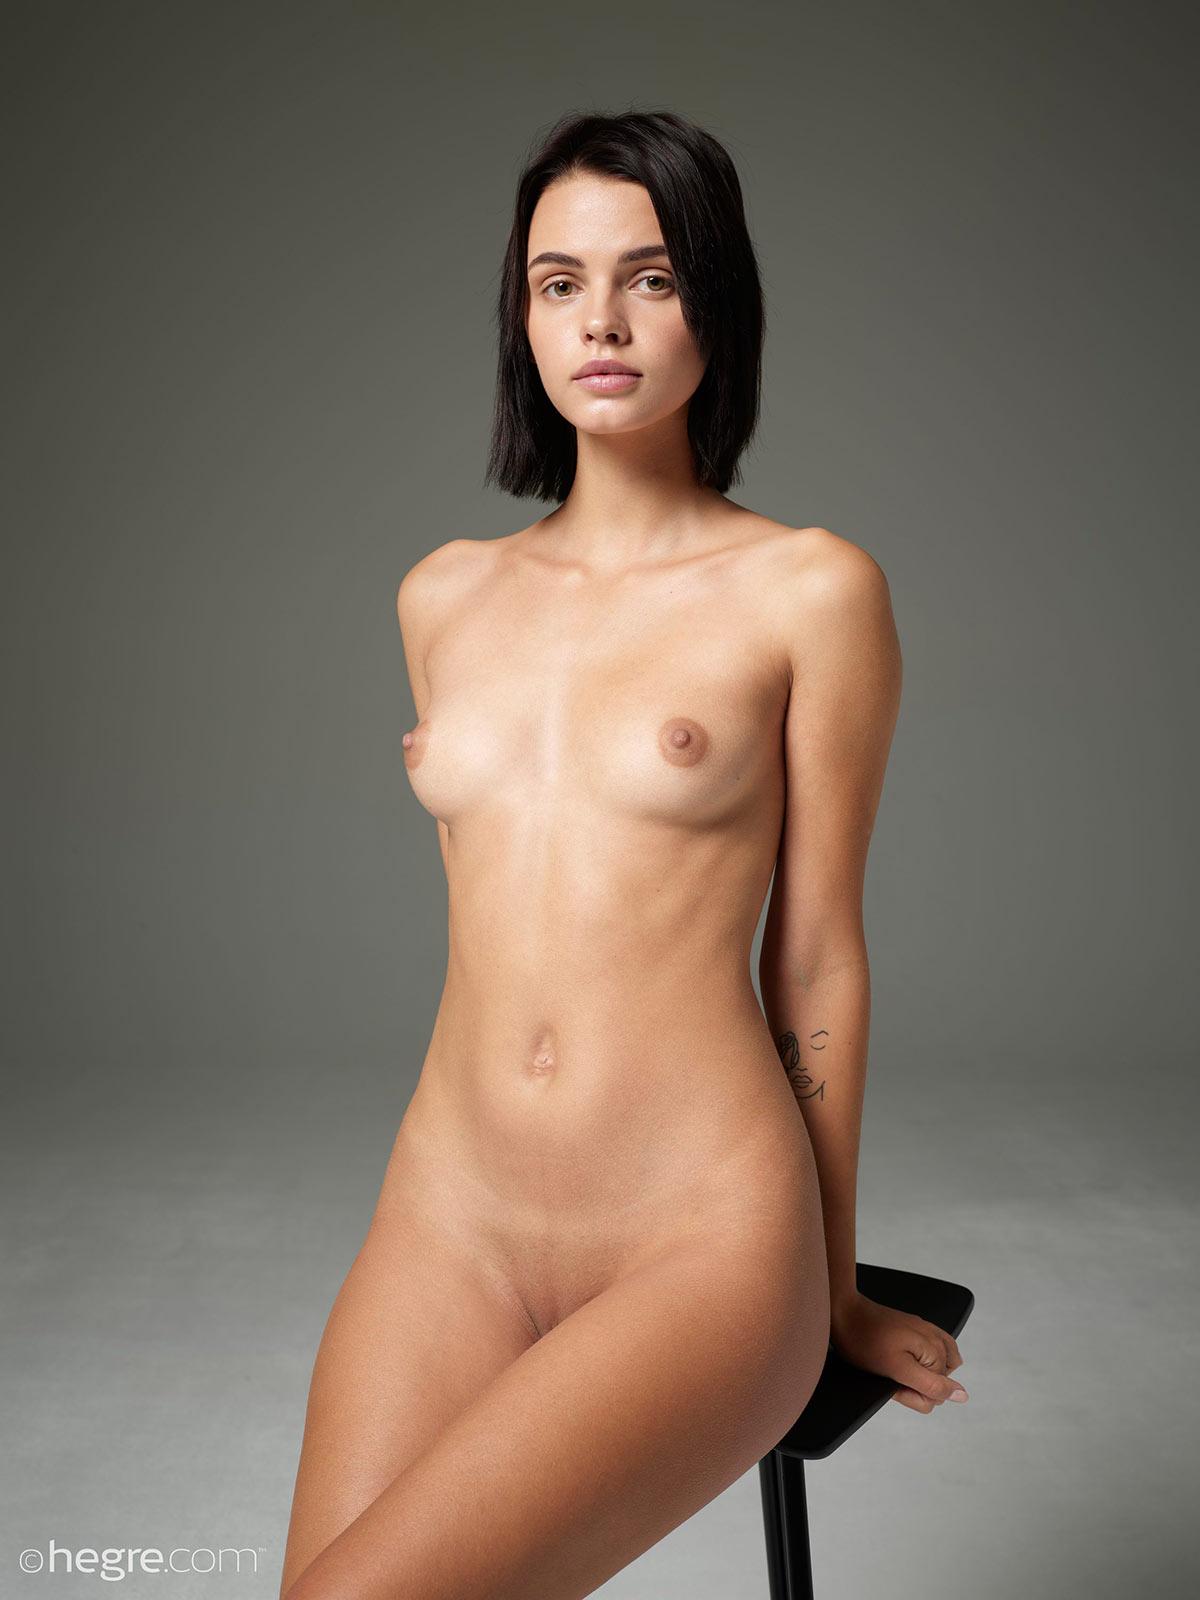 Ariel Nudes by Petter Hegre